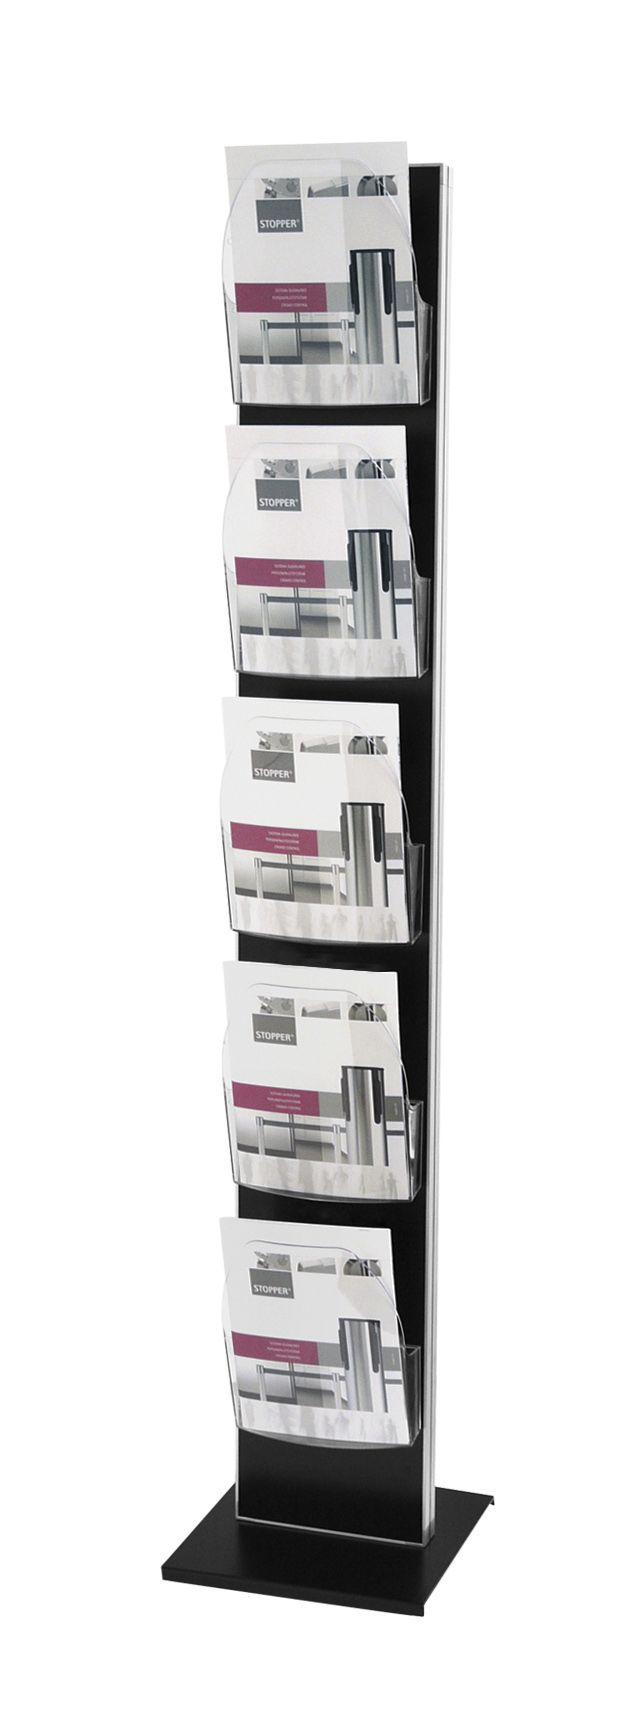 DACAPO IPOINT Brochure & Leaflet Holders - http://magnusongroup.com/products/brochureleafletholder/dacapoipoint.html